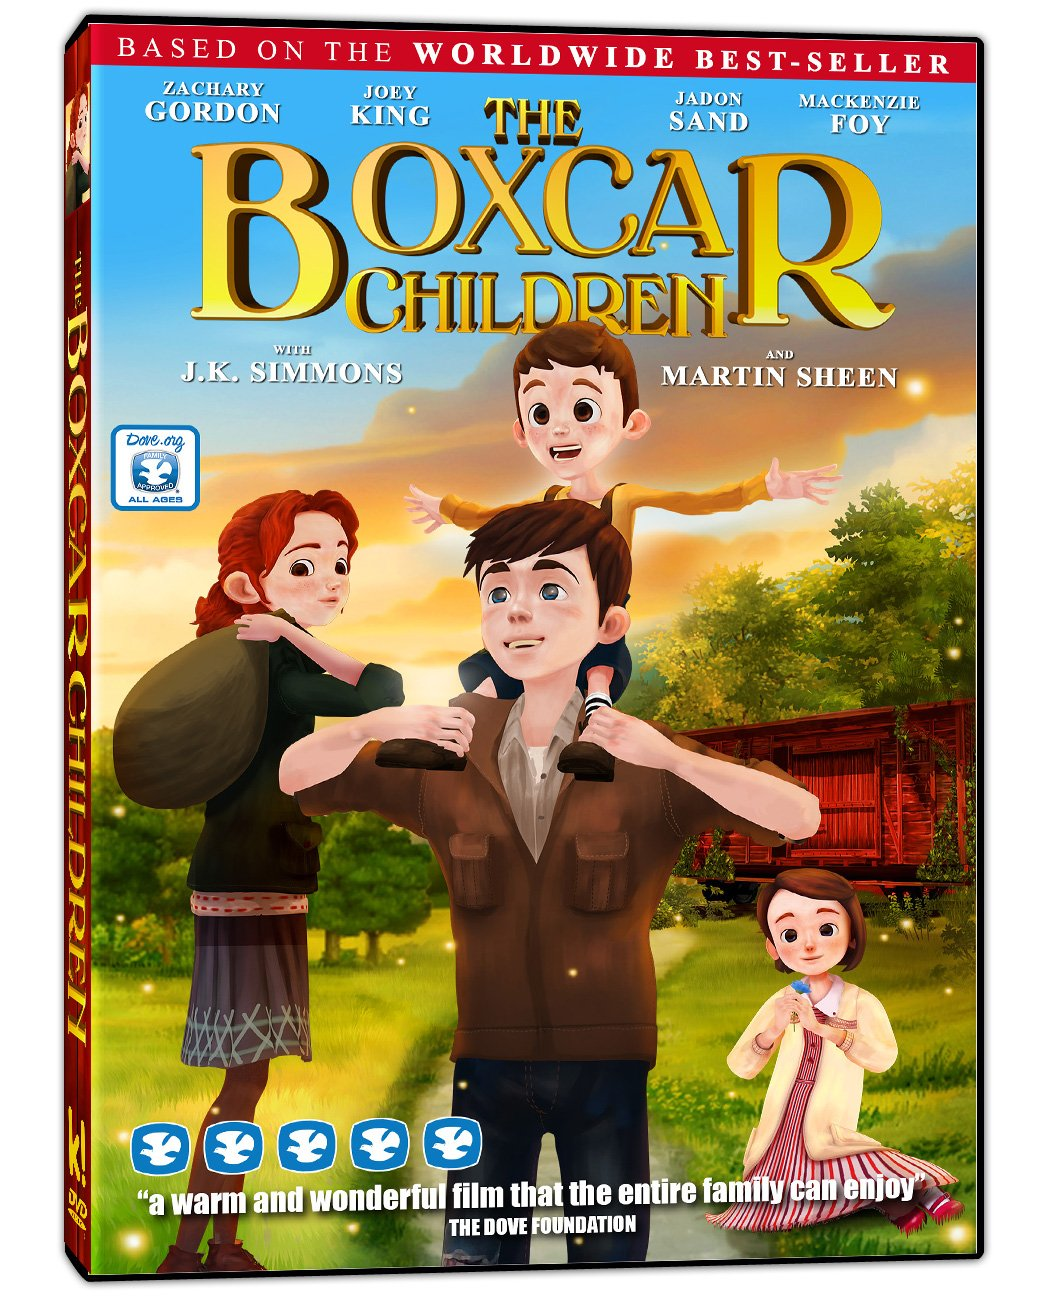 Amazon com: The Boxcar Children: Zachary Gordon, Joey King